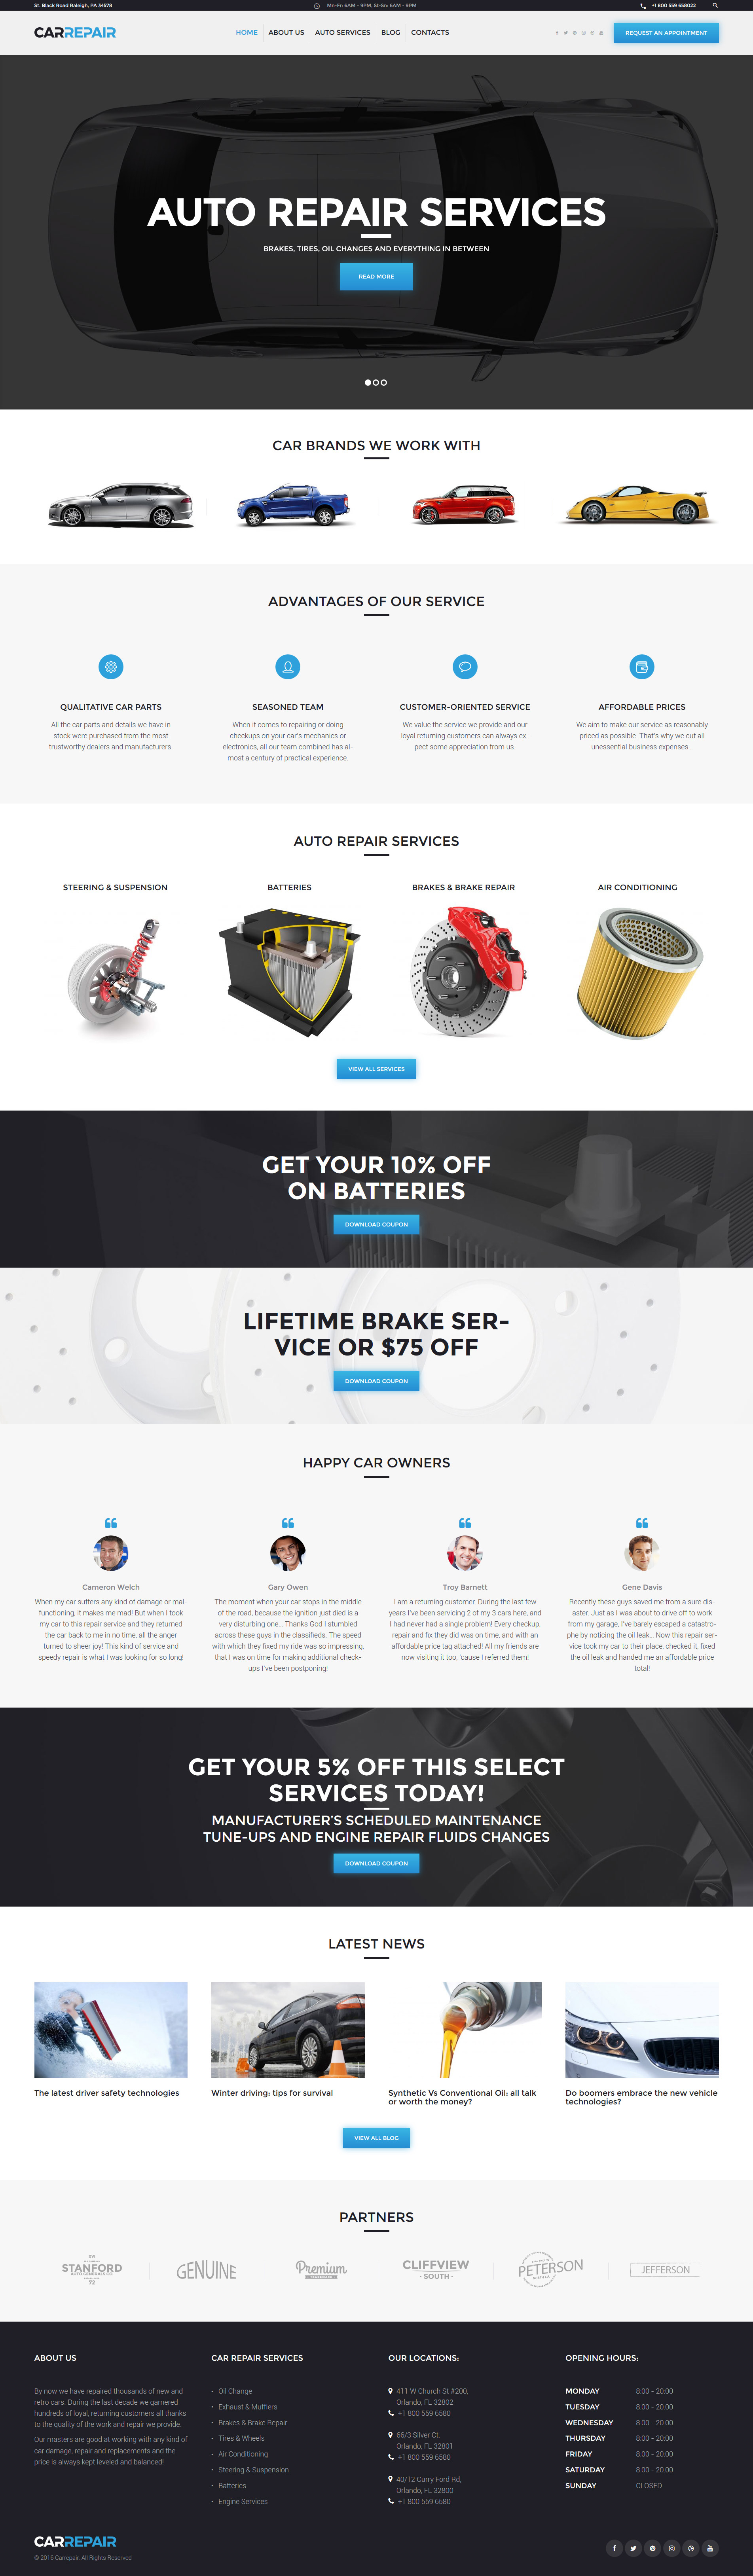 Reszponzív CarRepair - Auto Repair Services WordPress sablon 58676